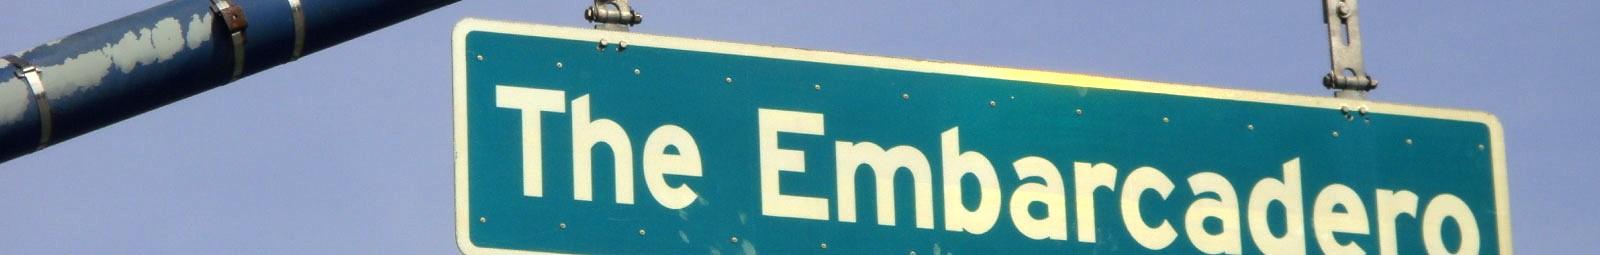 Embarcadero street sign in San Francisco, California